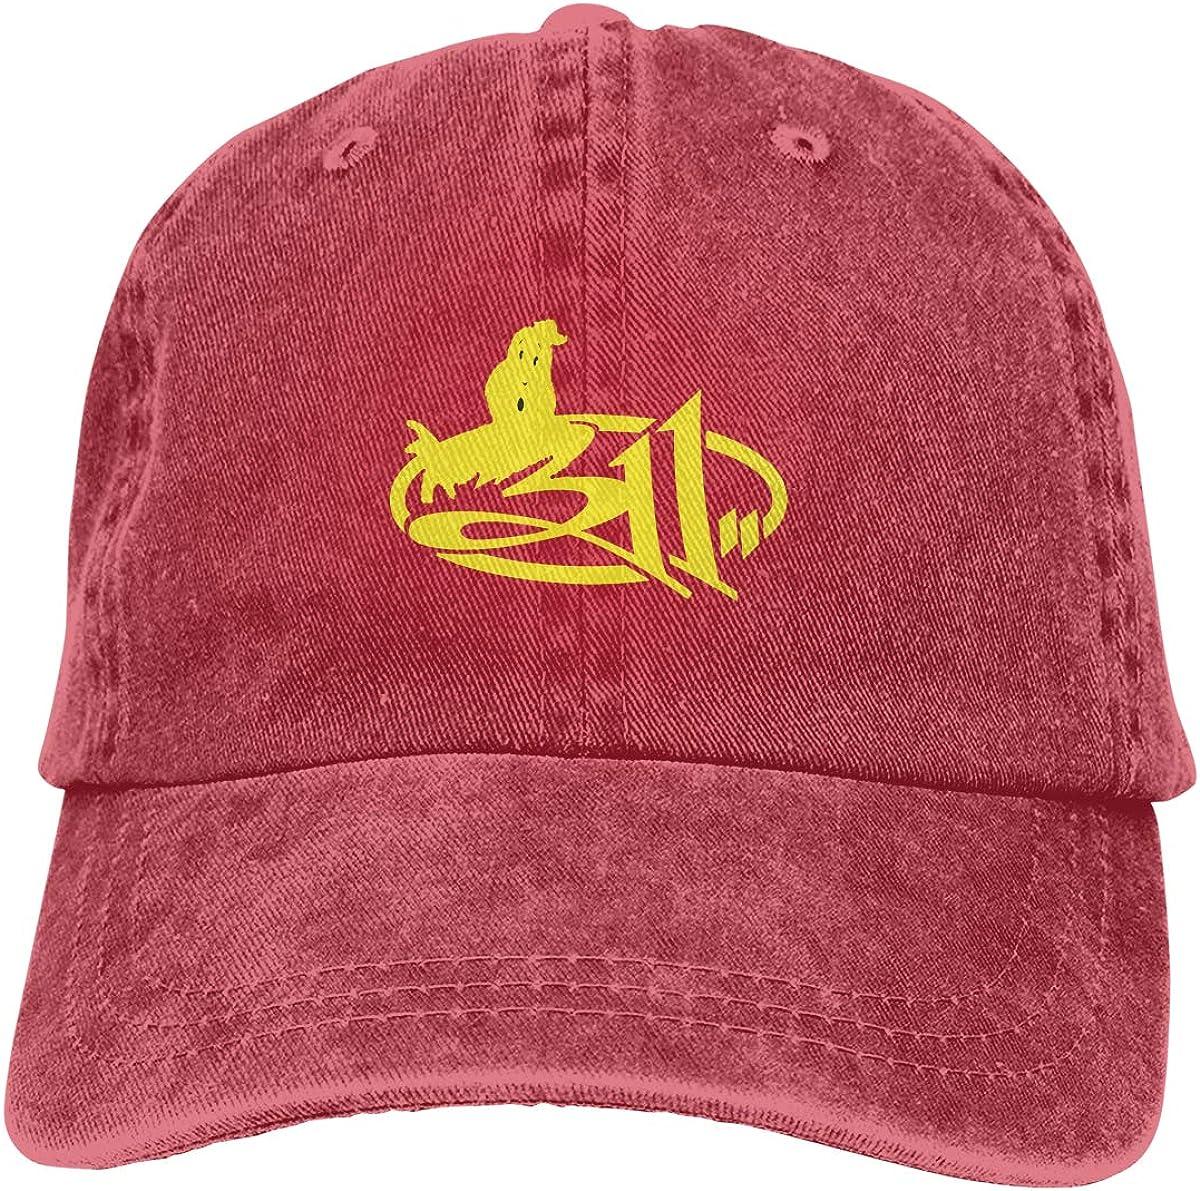 DIY 311 Rock Custom Fashion Baseball Hatblack